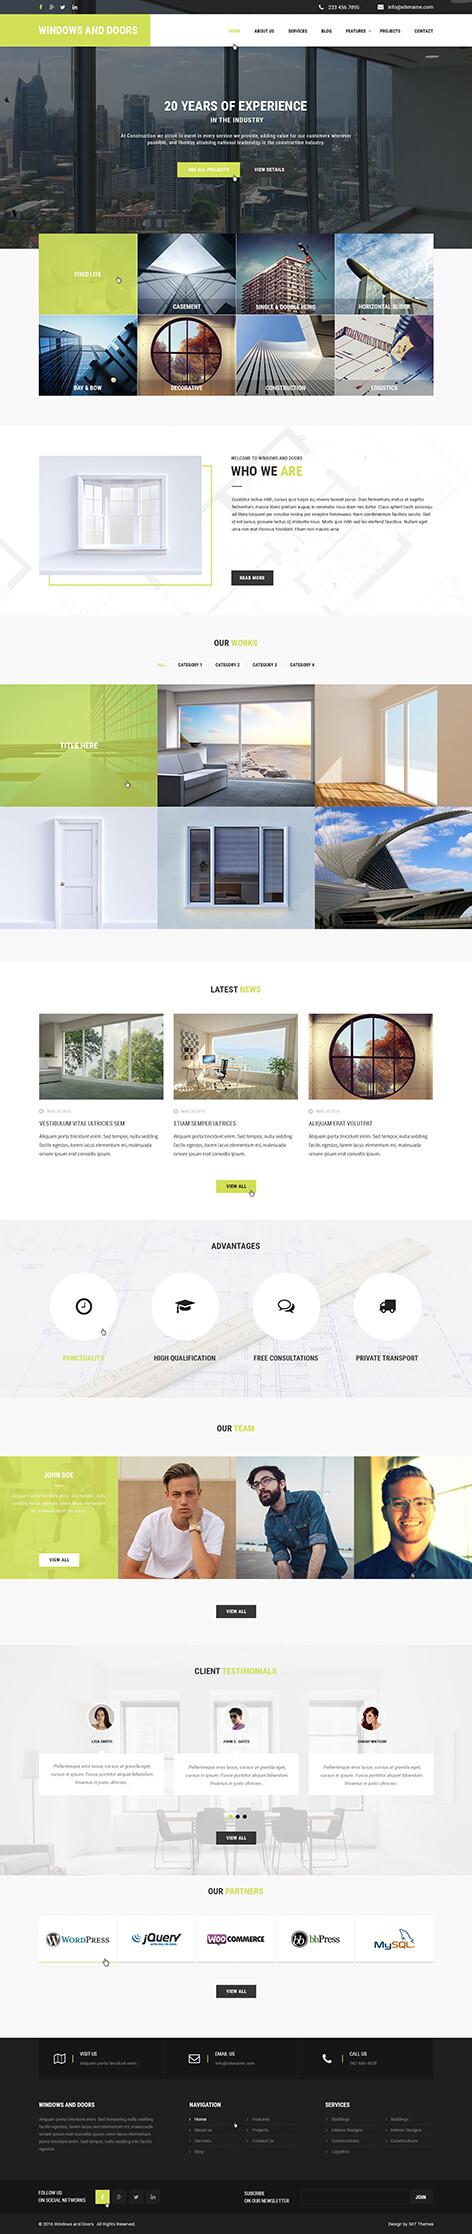 Windows and doors WordPress theme